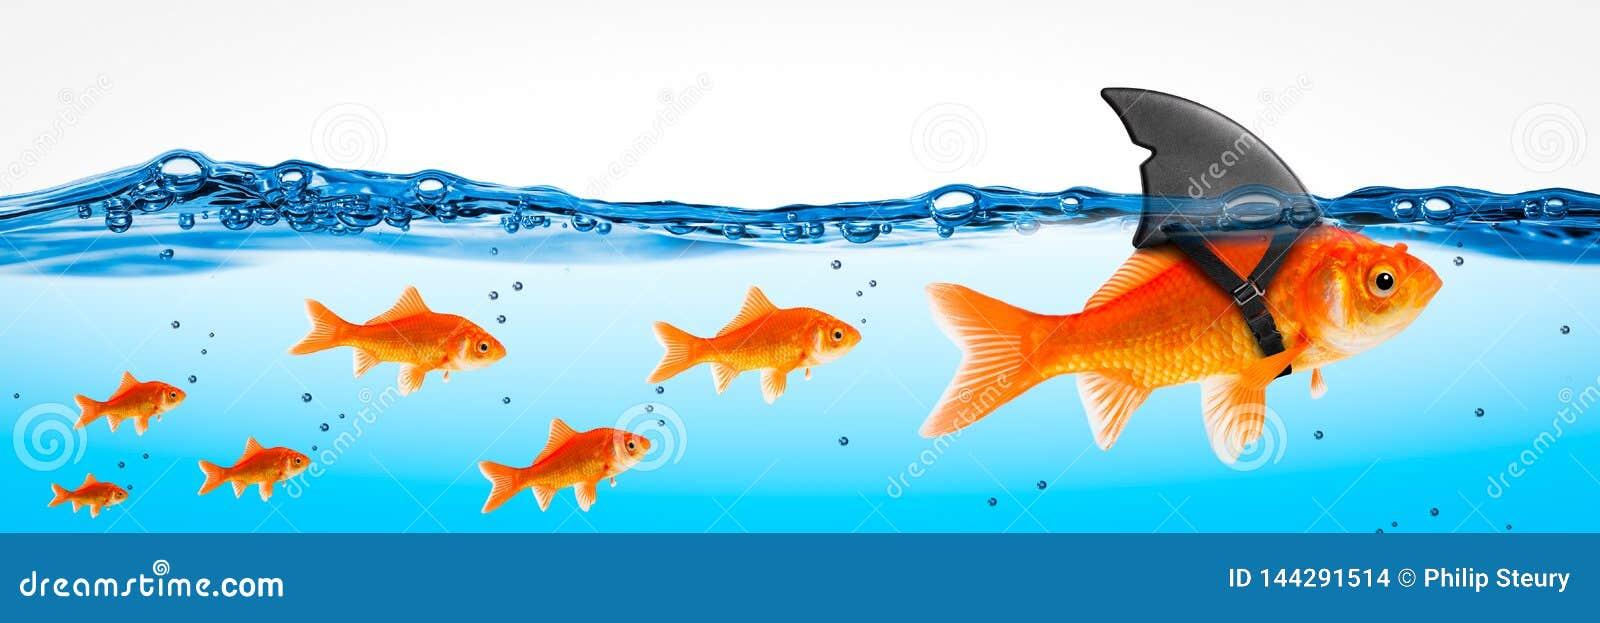 Mały Odważny Goldfish lider